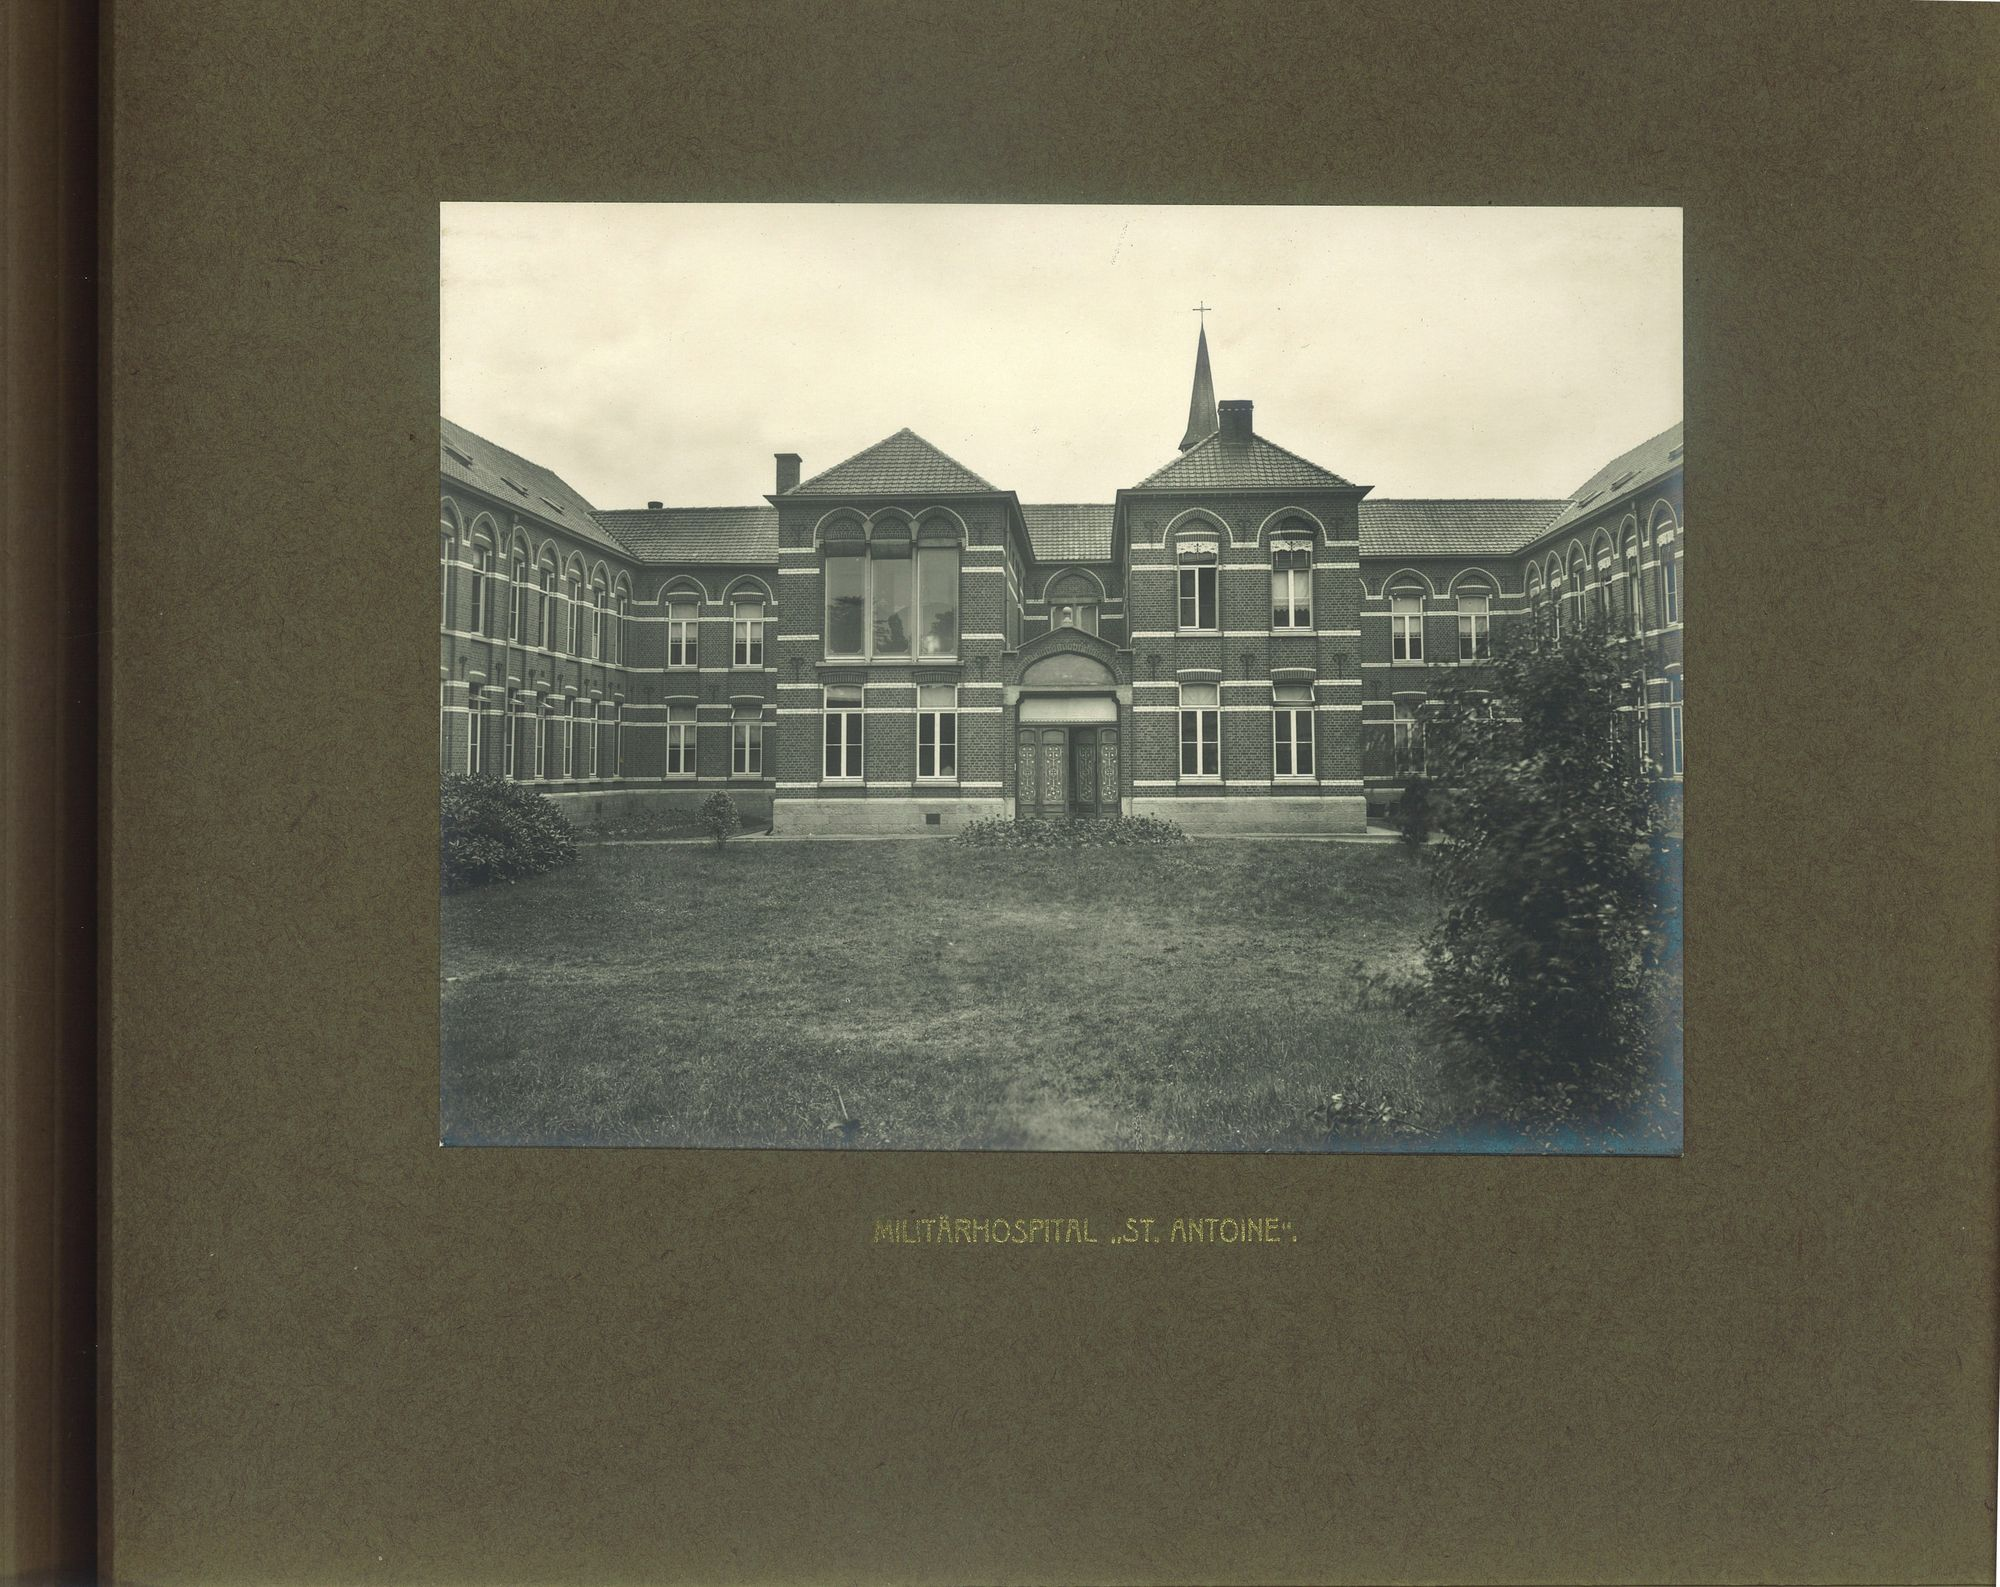 Militair hospitaal Saint-Antoine